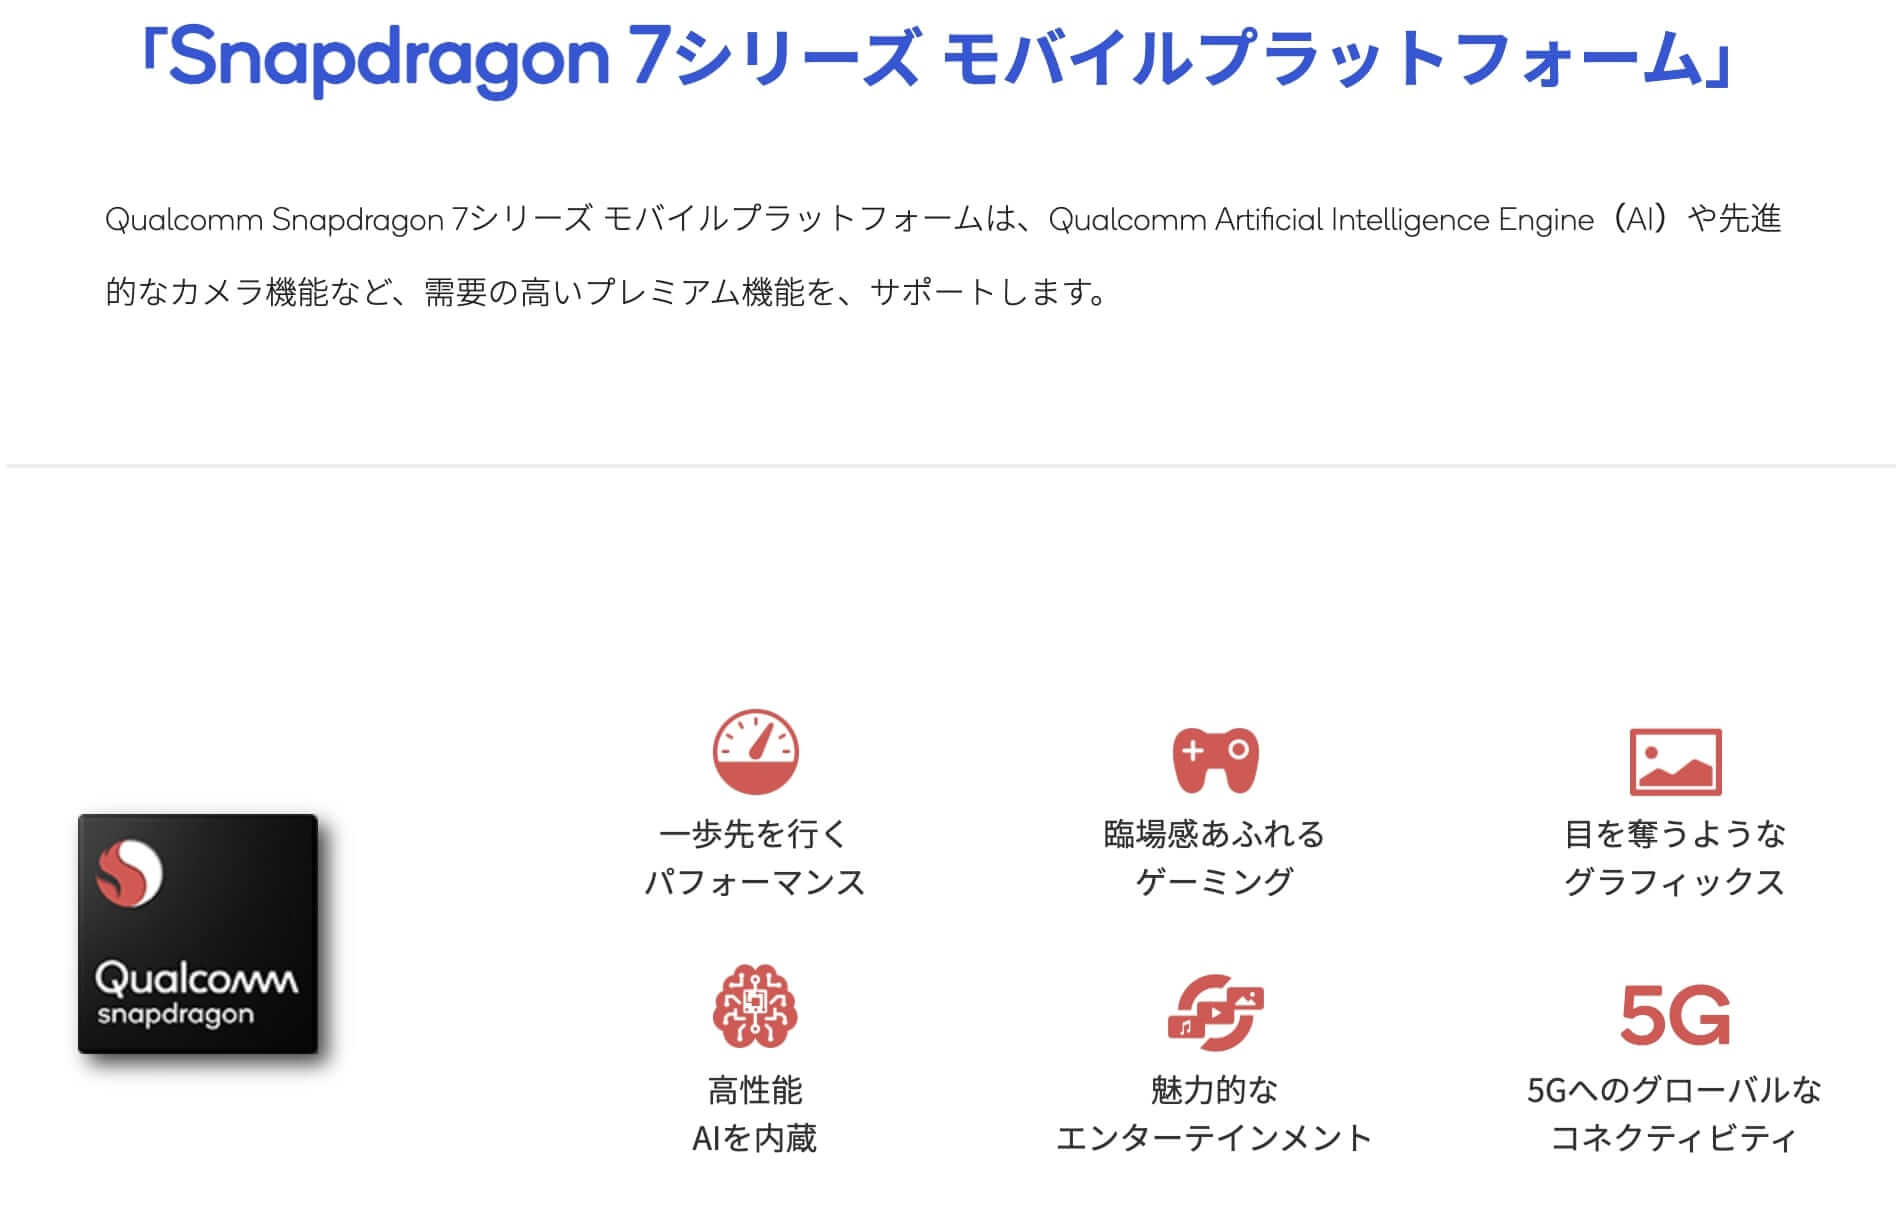 Snapdragon 7シリーズ